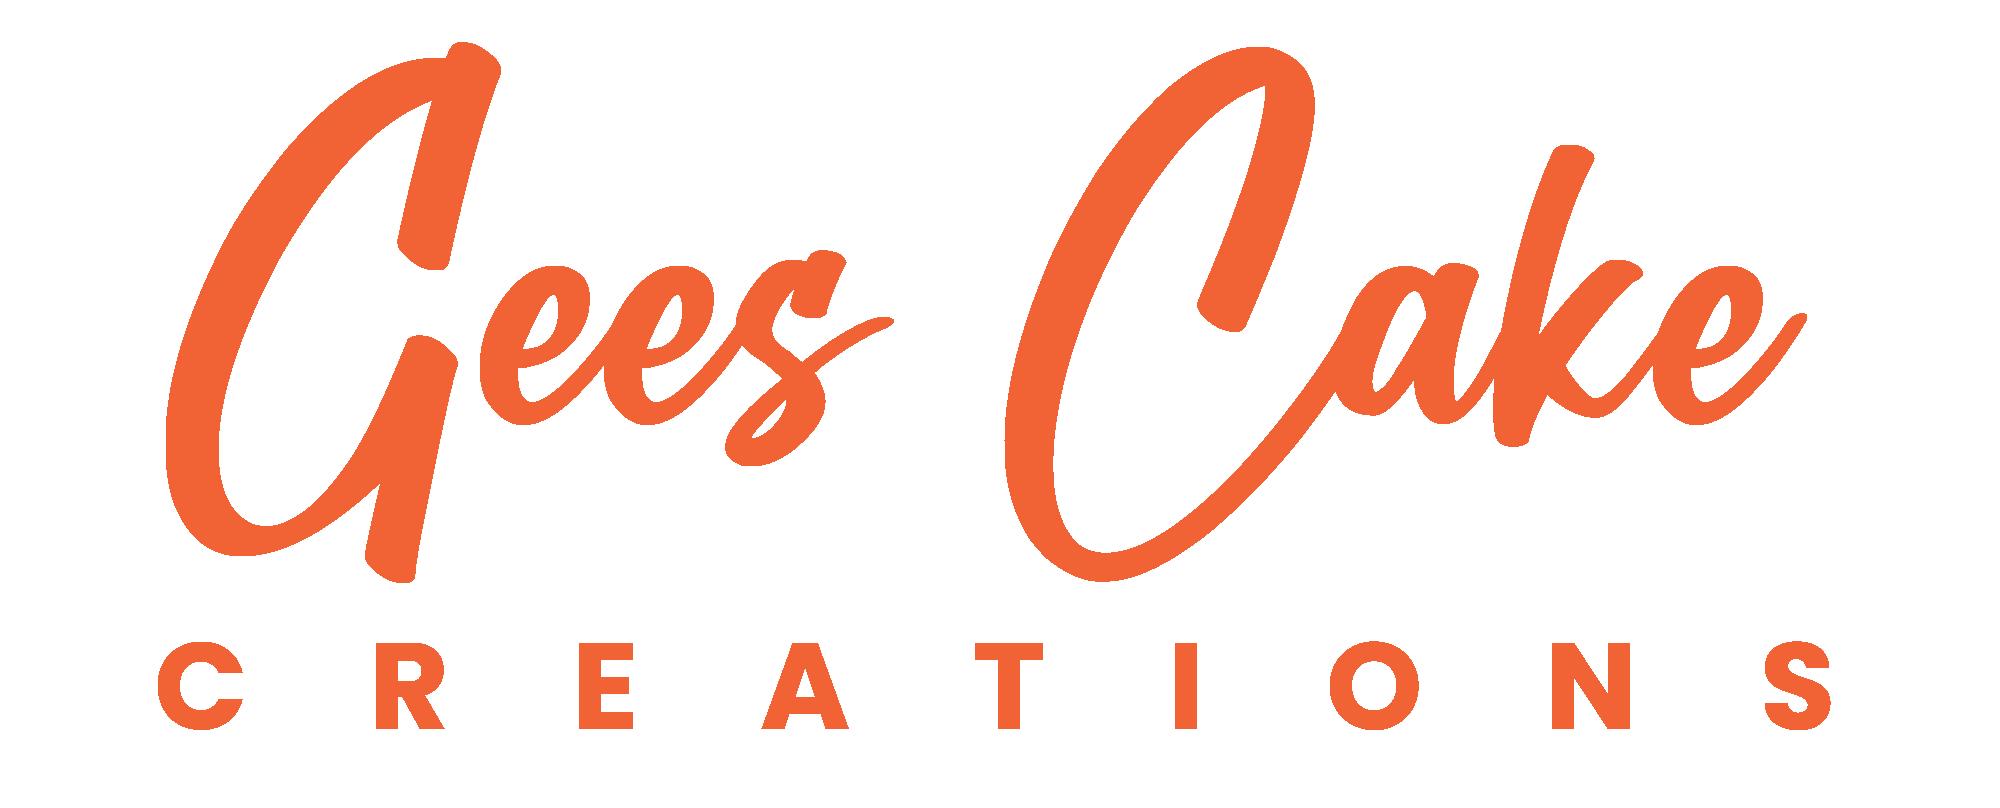 Gees Cake Creation